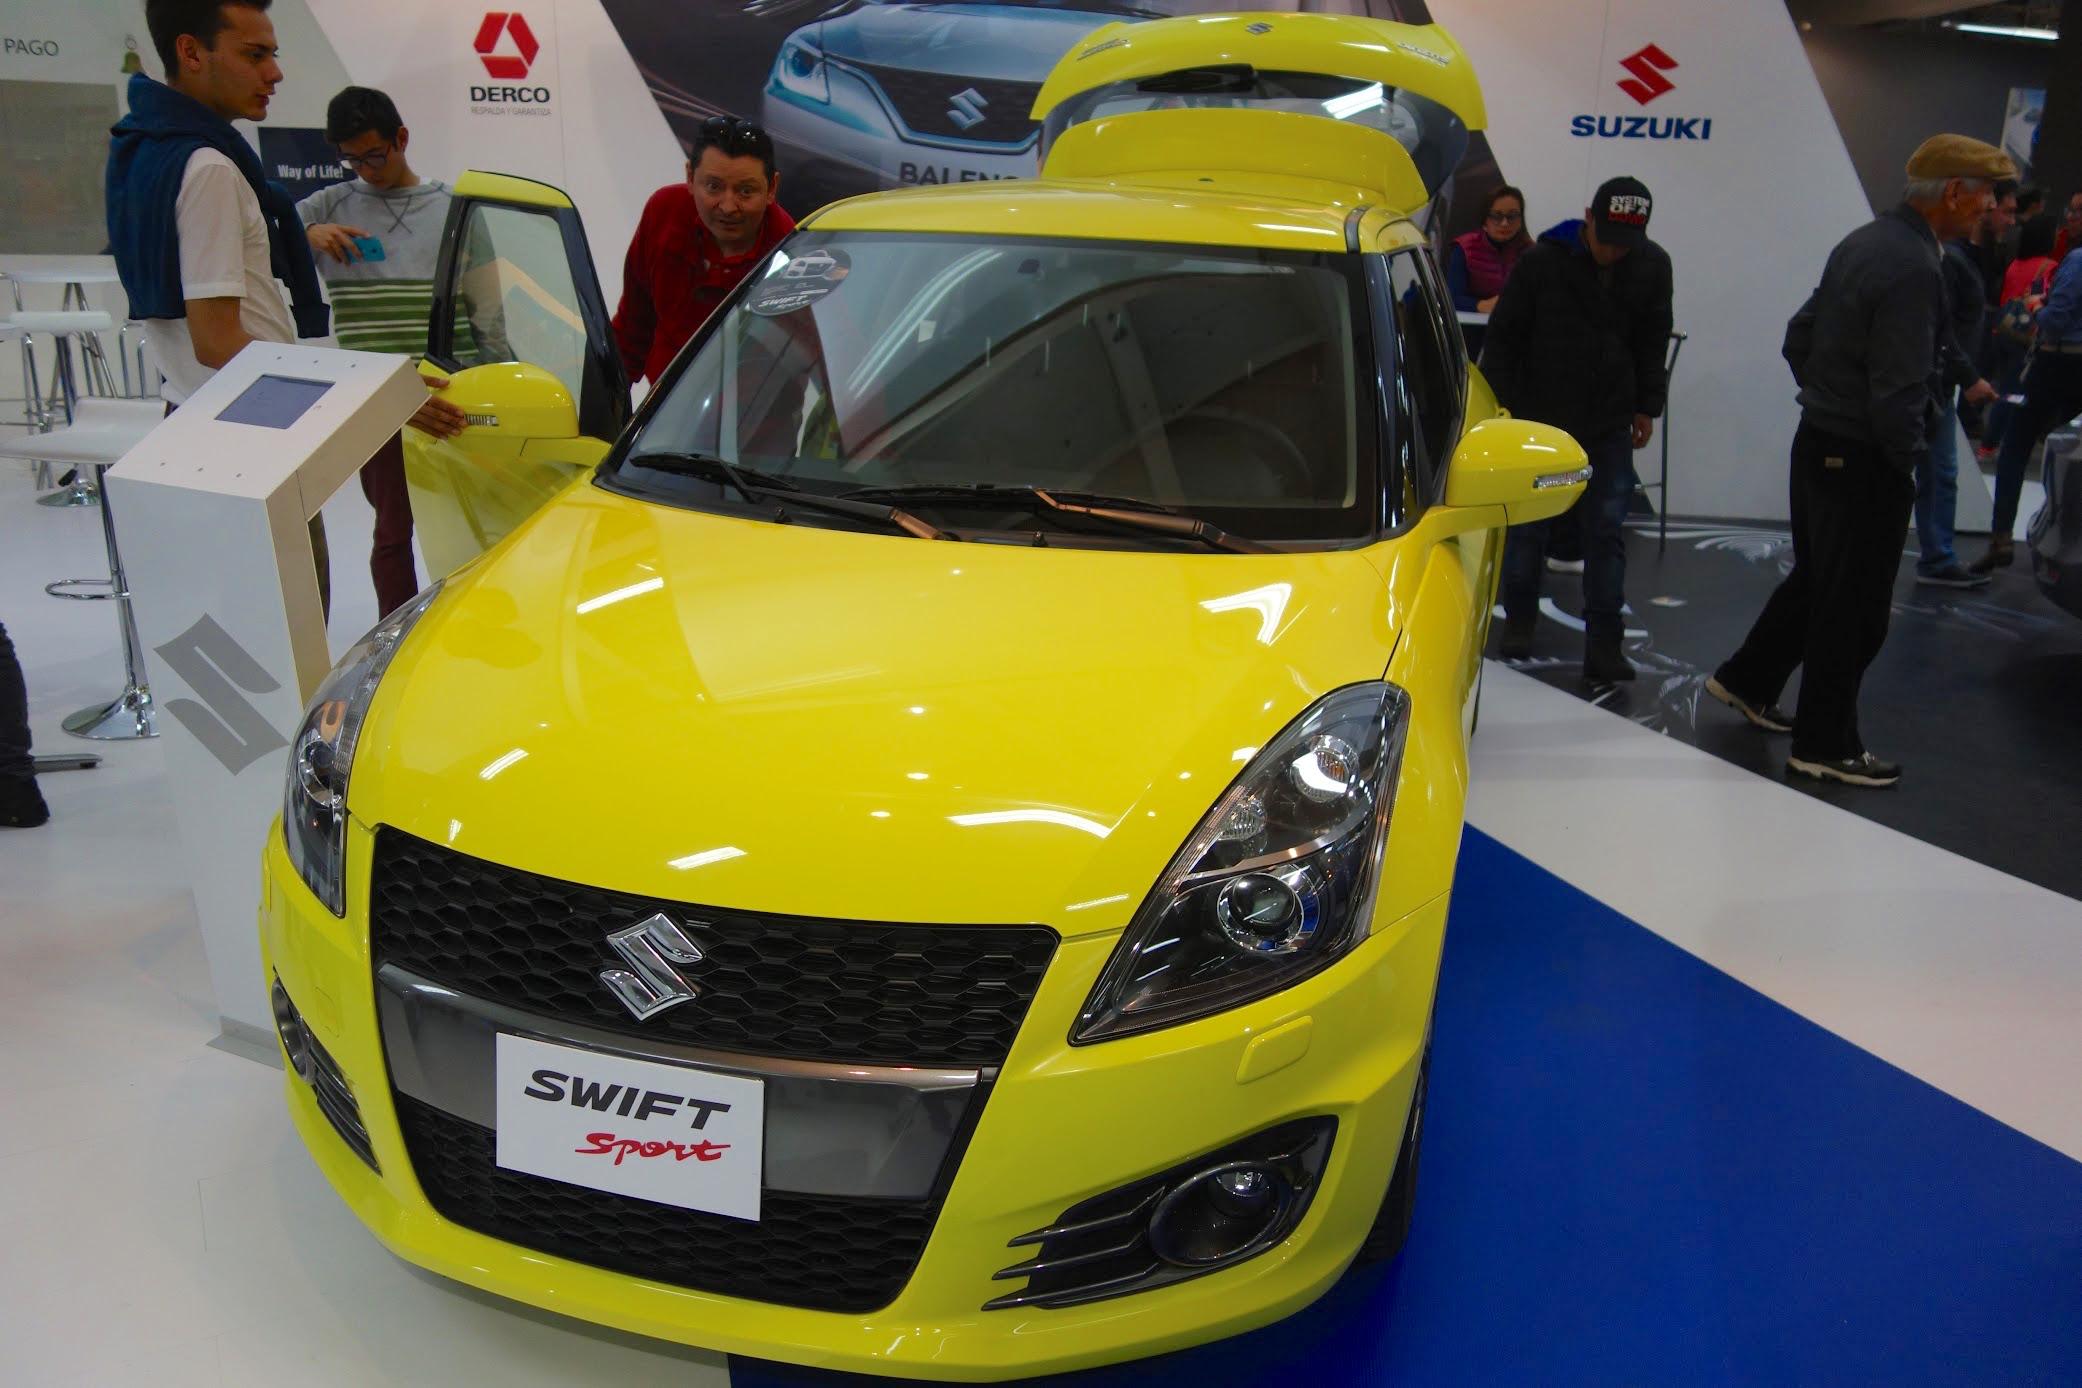 suzuki-swift-sport-at-the-bogota-motor-show